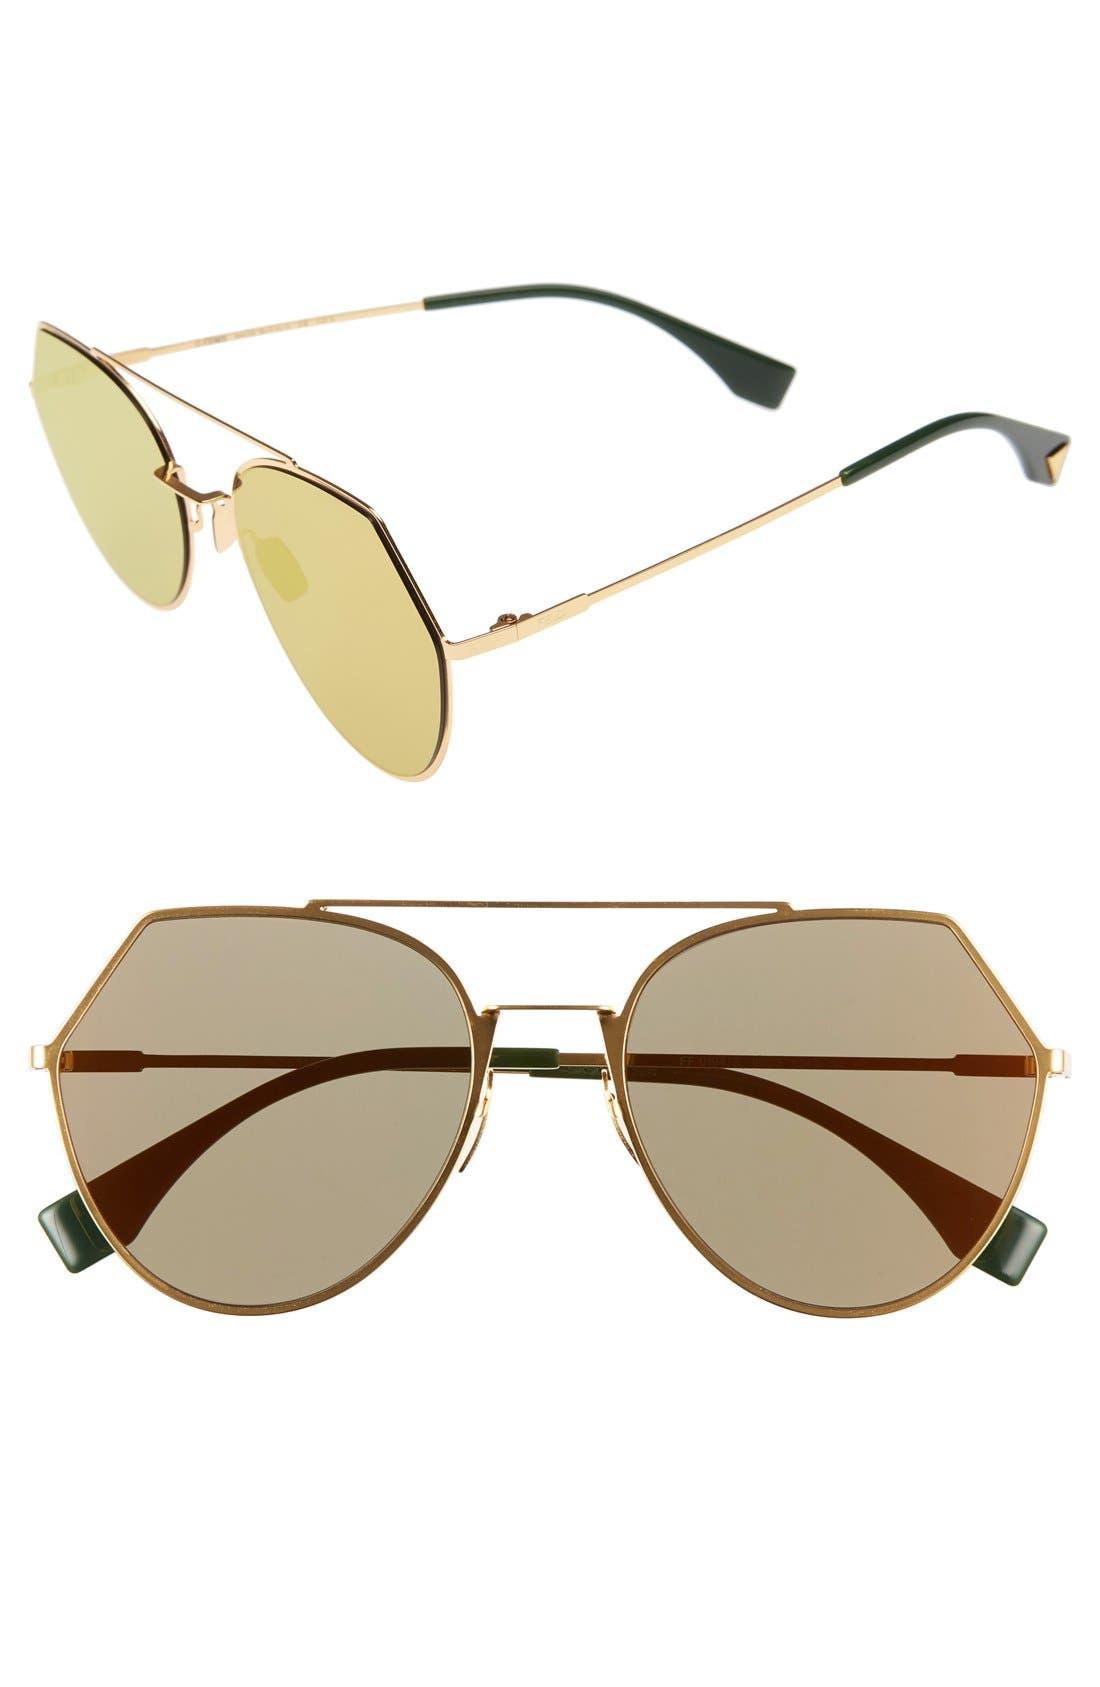 Eyeline 55mm Sunglasses,                             Main thumbnail 1, color,                             Yellow Gold